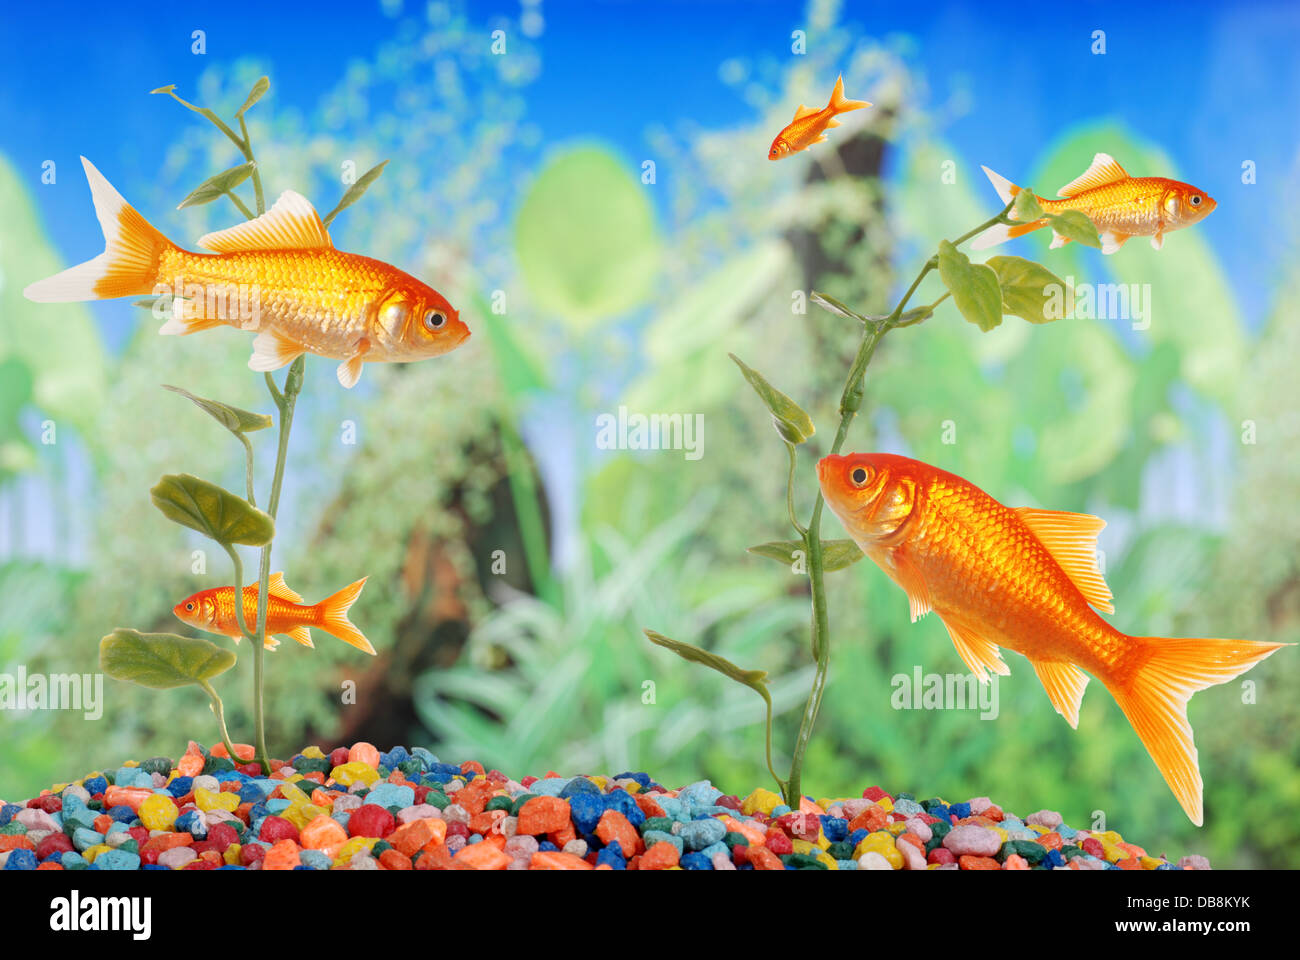 fish tank with goldfish - Stock Image